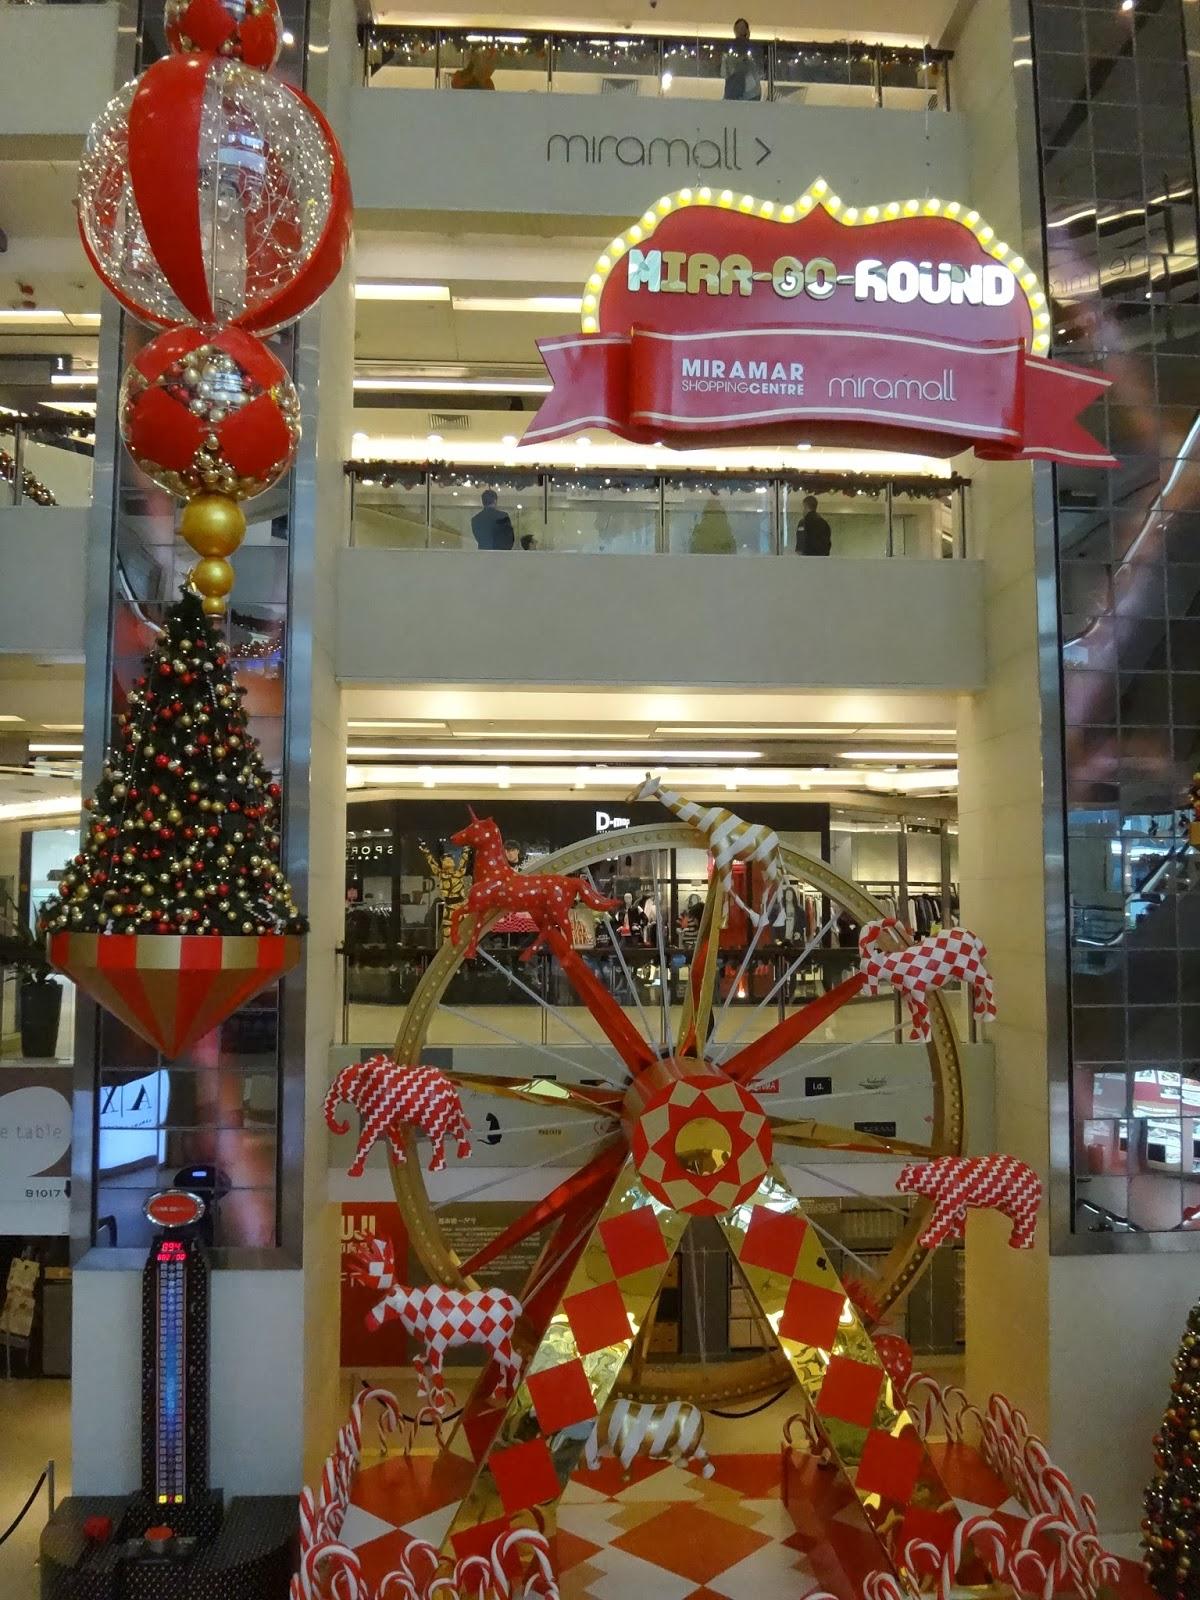 Soldier 的世界: 尖沙咀美麗華商場: 潮流幾何轉出快樂聖誕